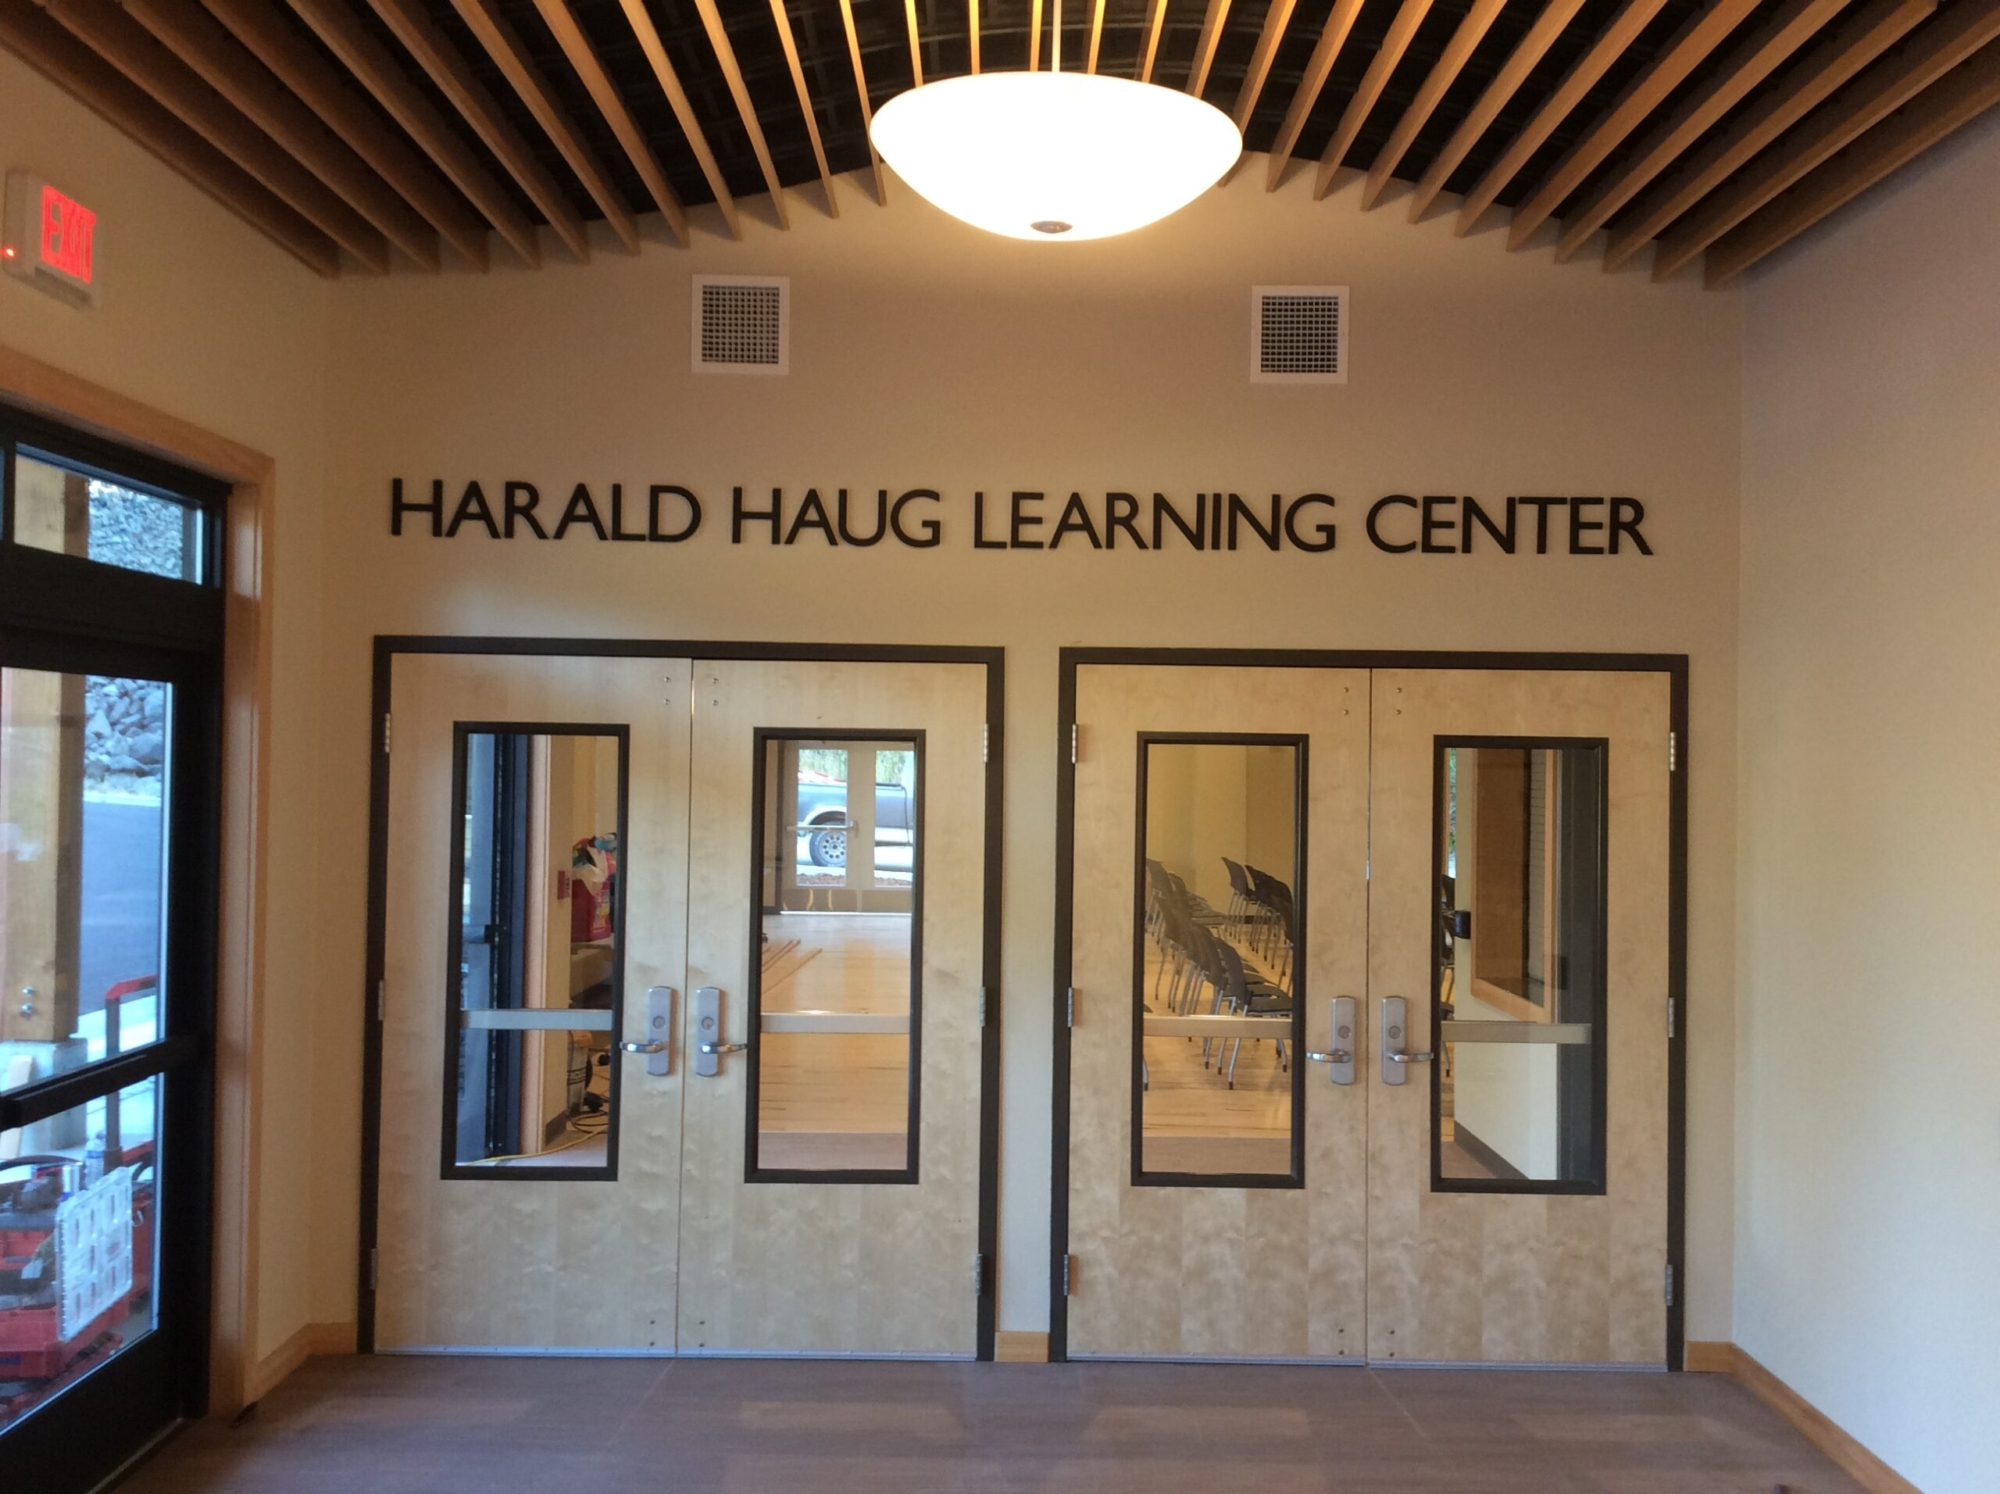 Meeting Hall Entrance